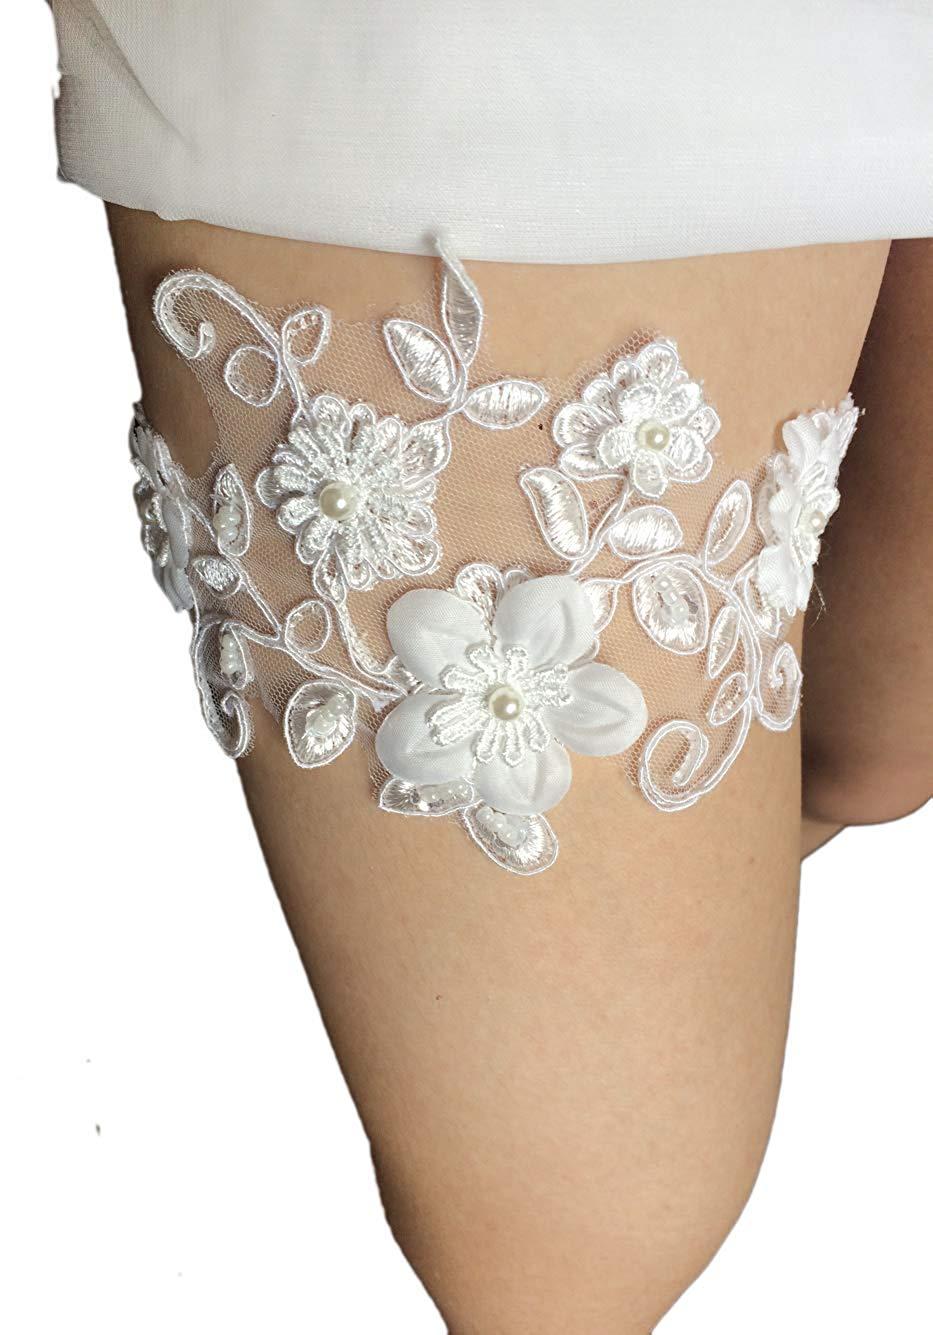 13aab566fab Get Quotations · Belyee Lady Sexy Lace Wedding Garters for Bride  Rhinestones Leg Bridal Garter